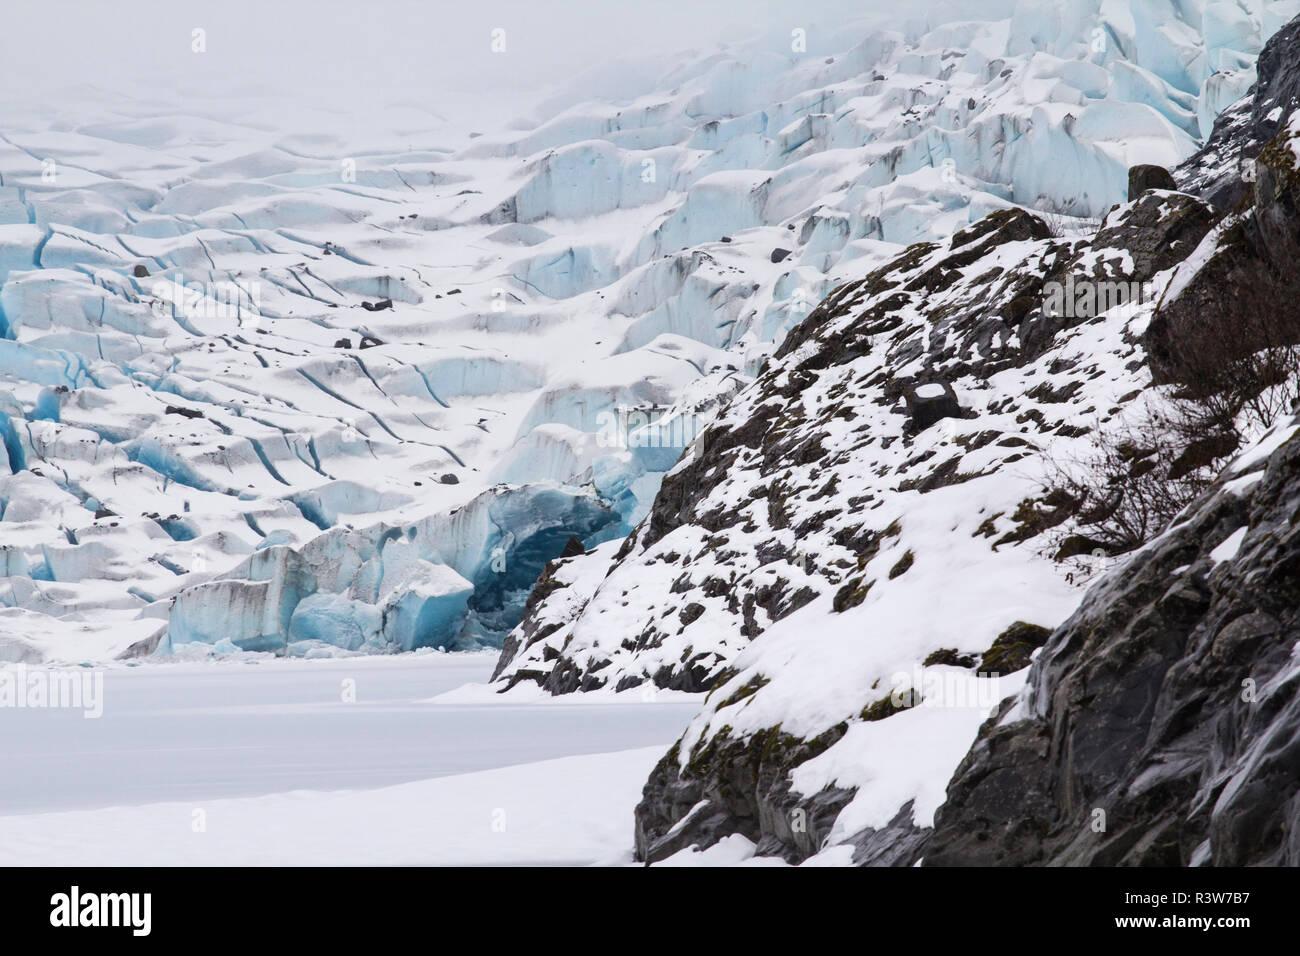 USA, Alaska. A close up view of Mendenhall Glacier and Mendenhall Lake in winter. - Stock Image